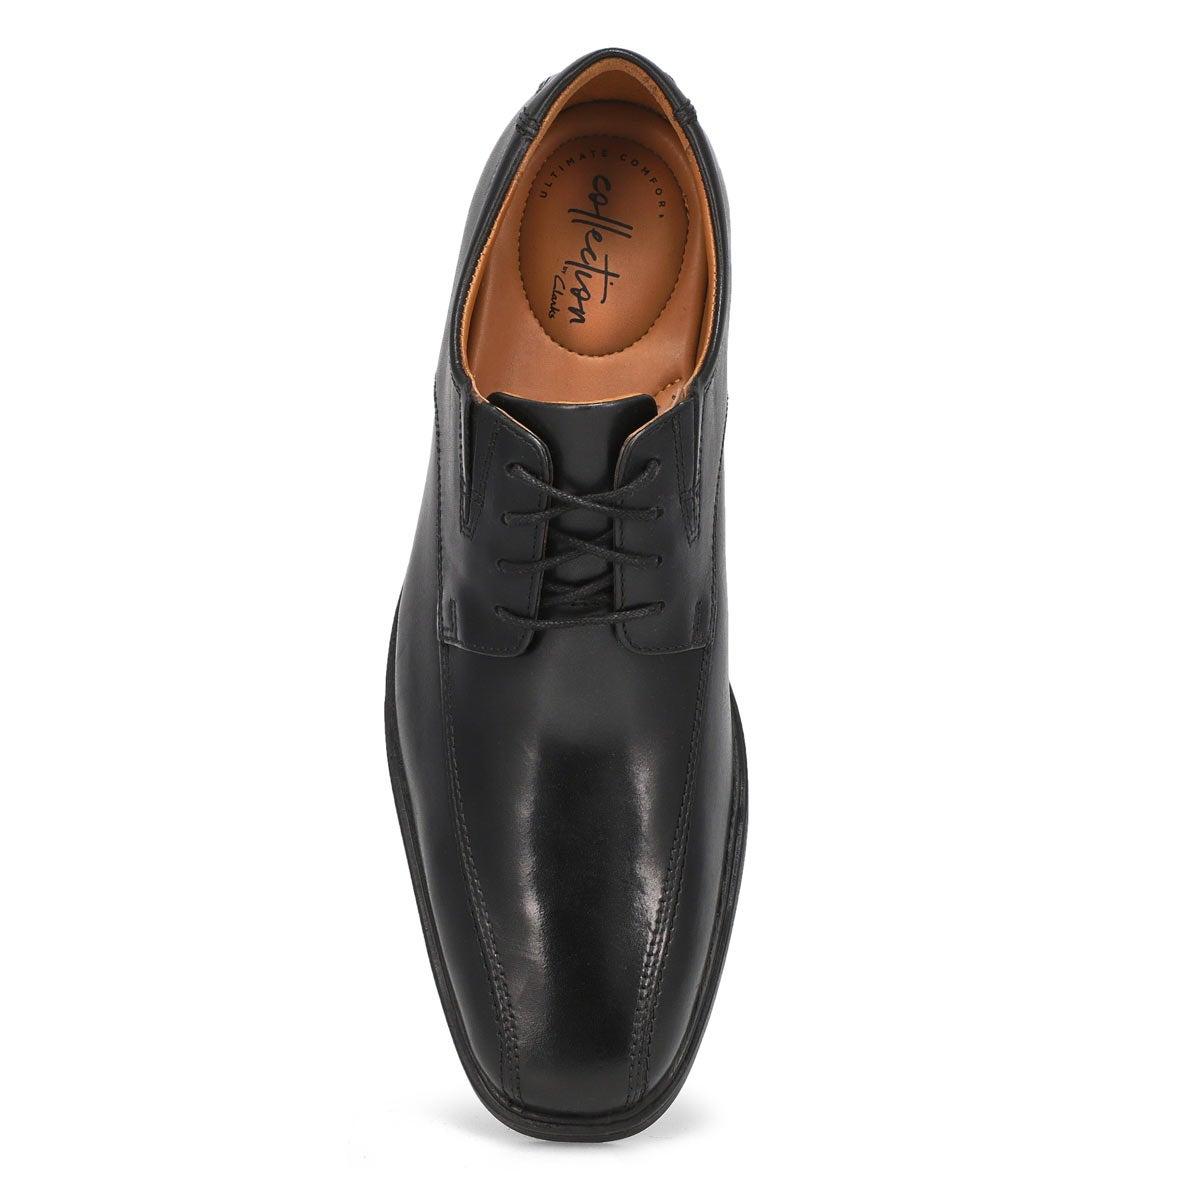 Mns Tilden Walk black dress oxford